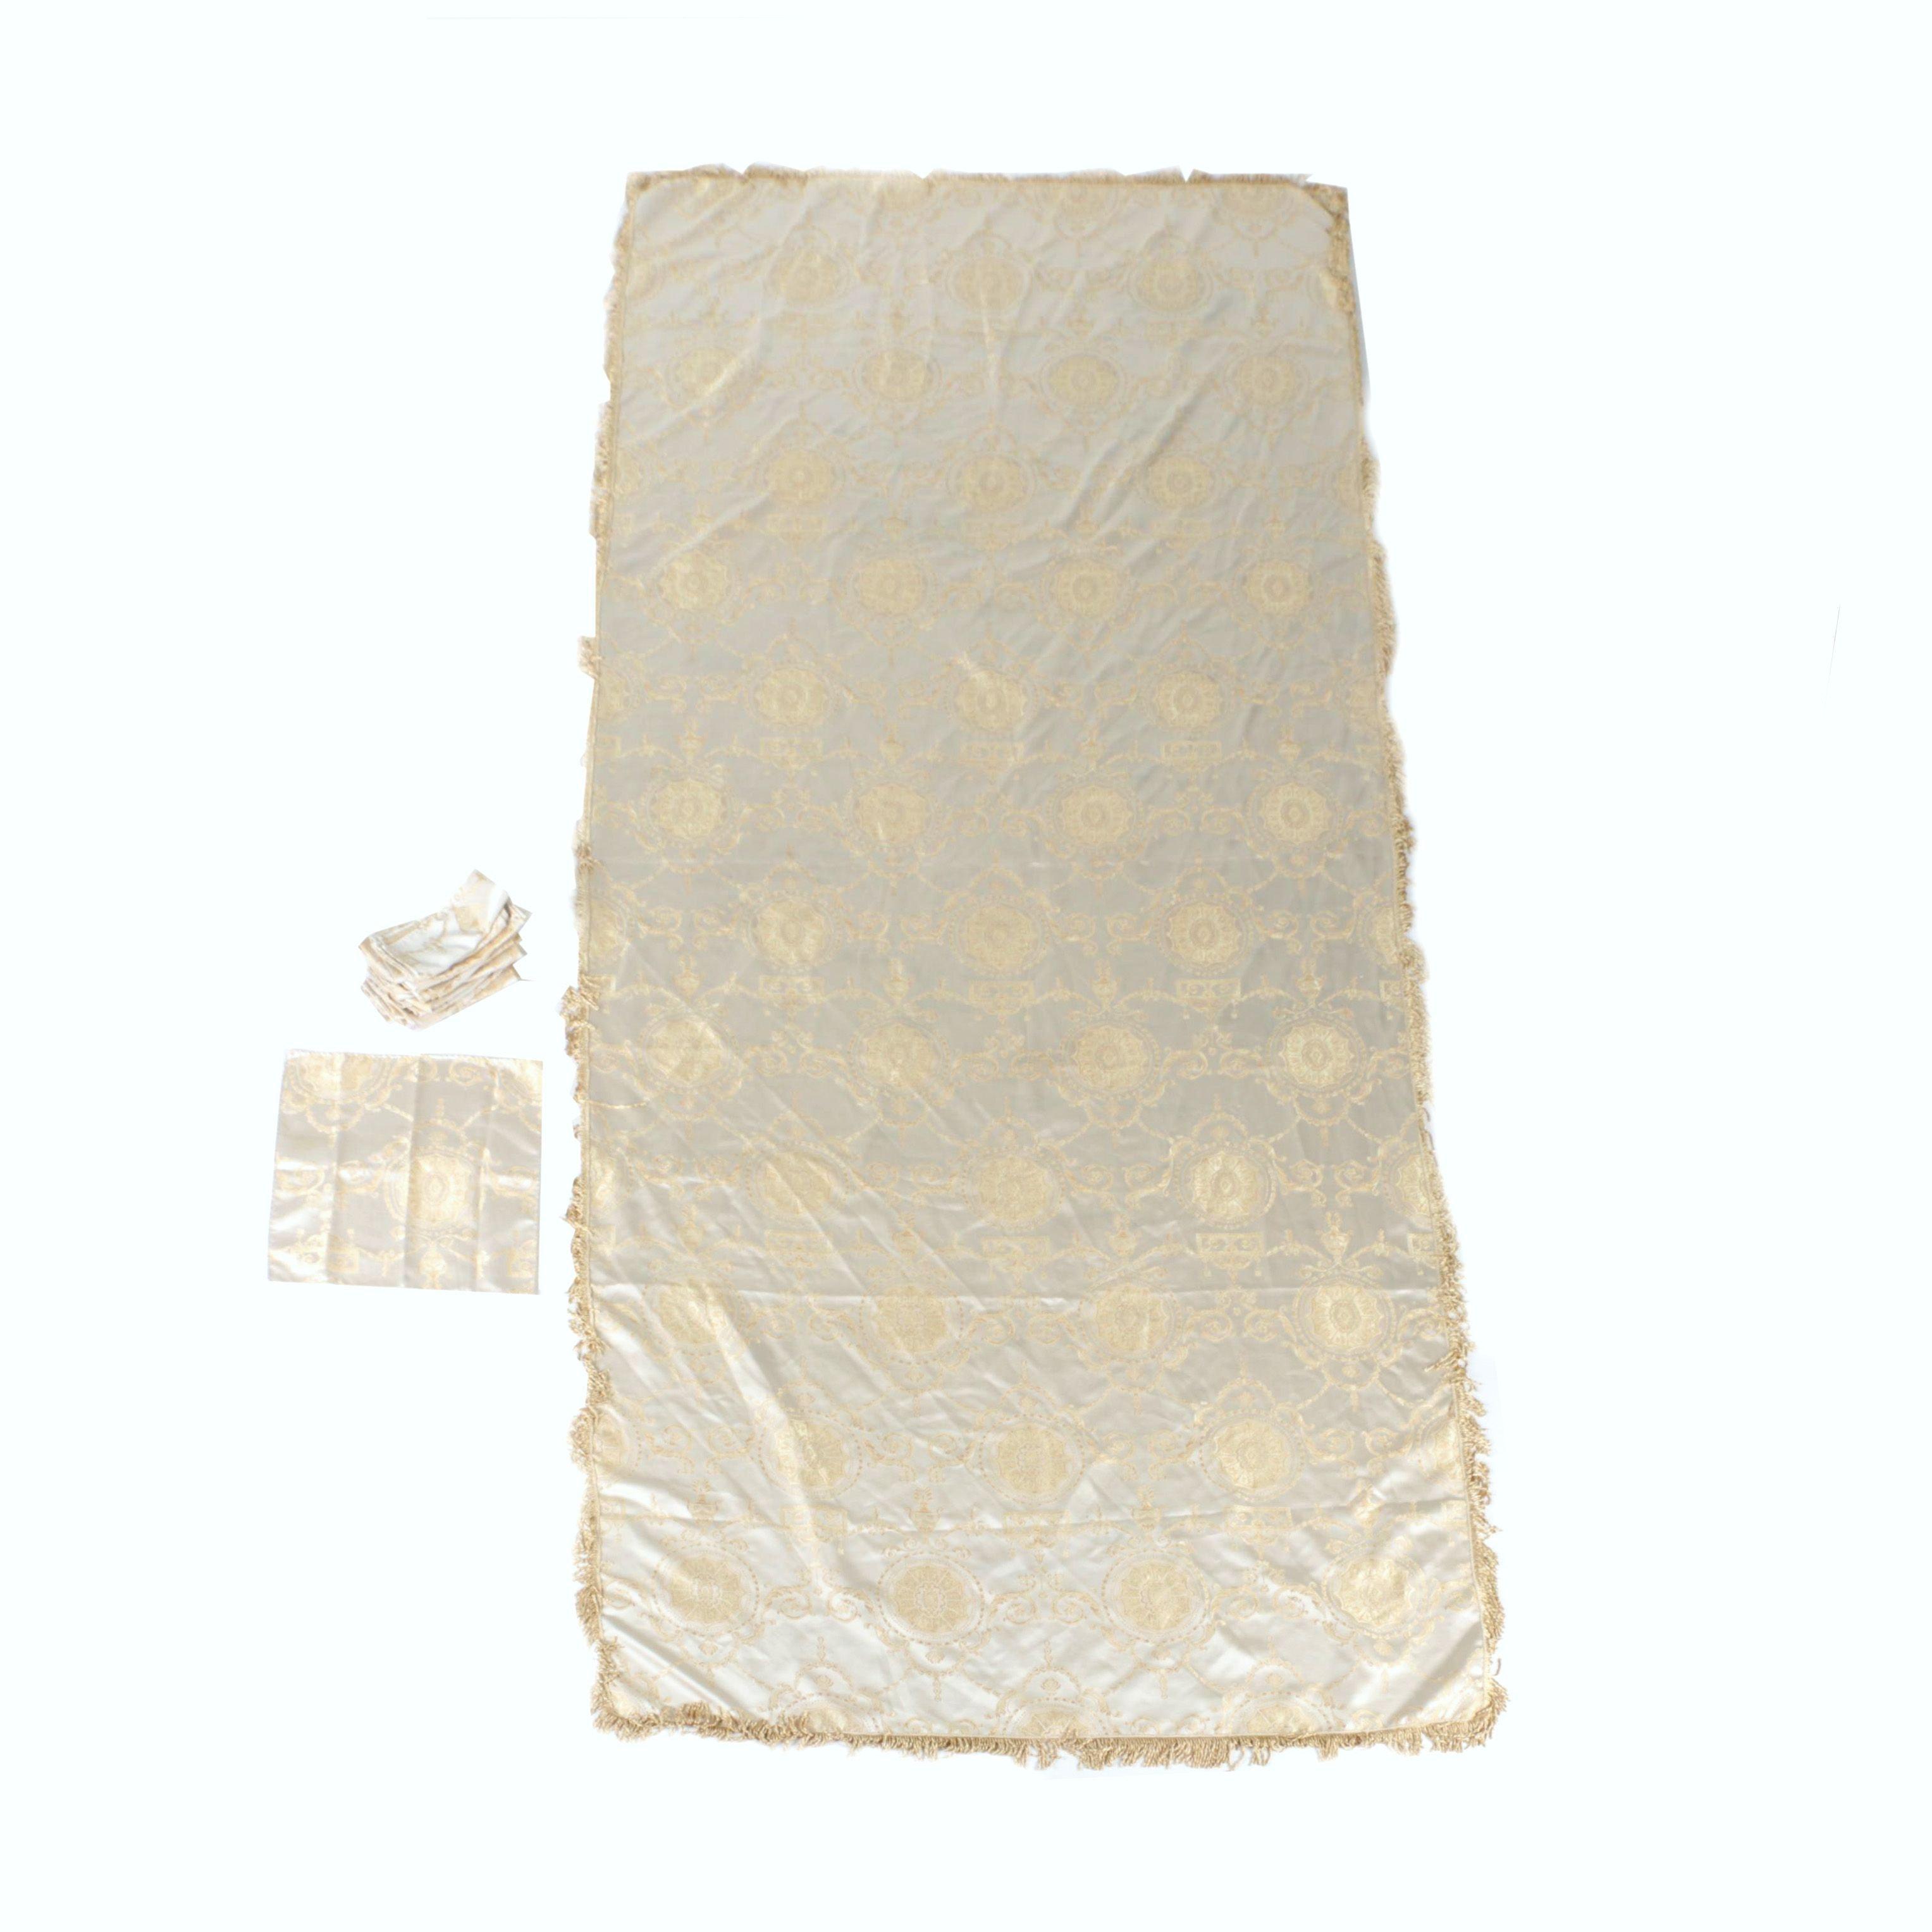 Violet Damask Table Cloth and Napkin Set